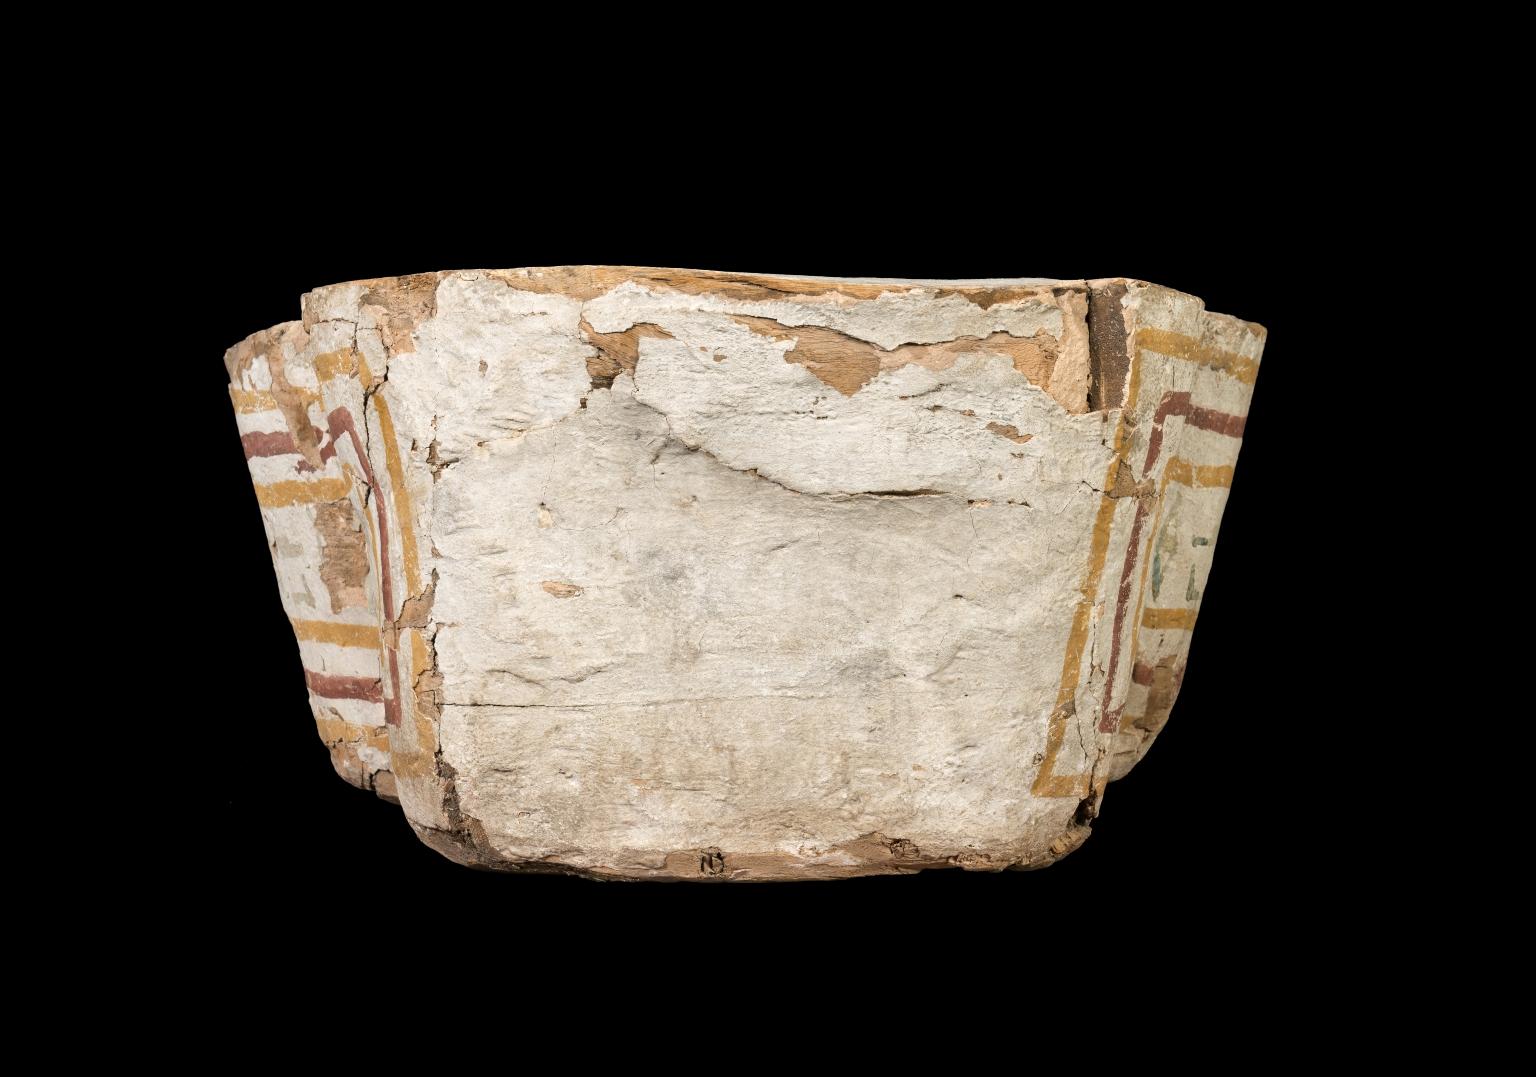 Sarcophagus bottom